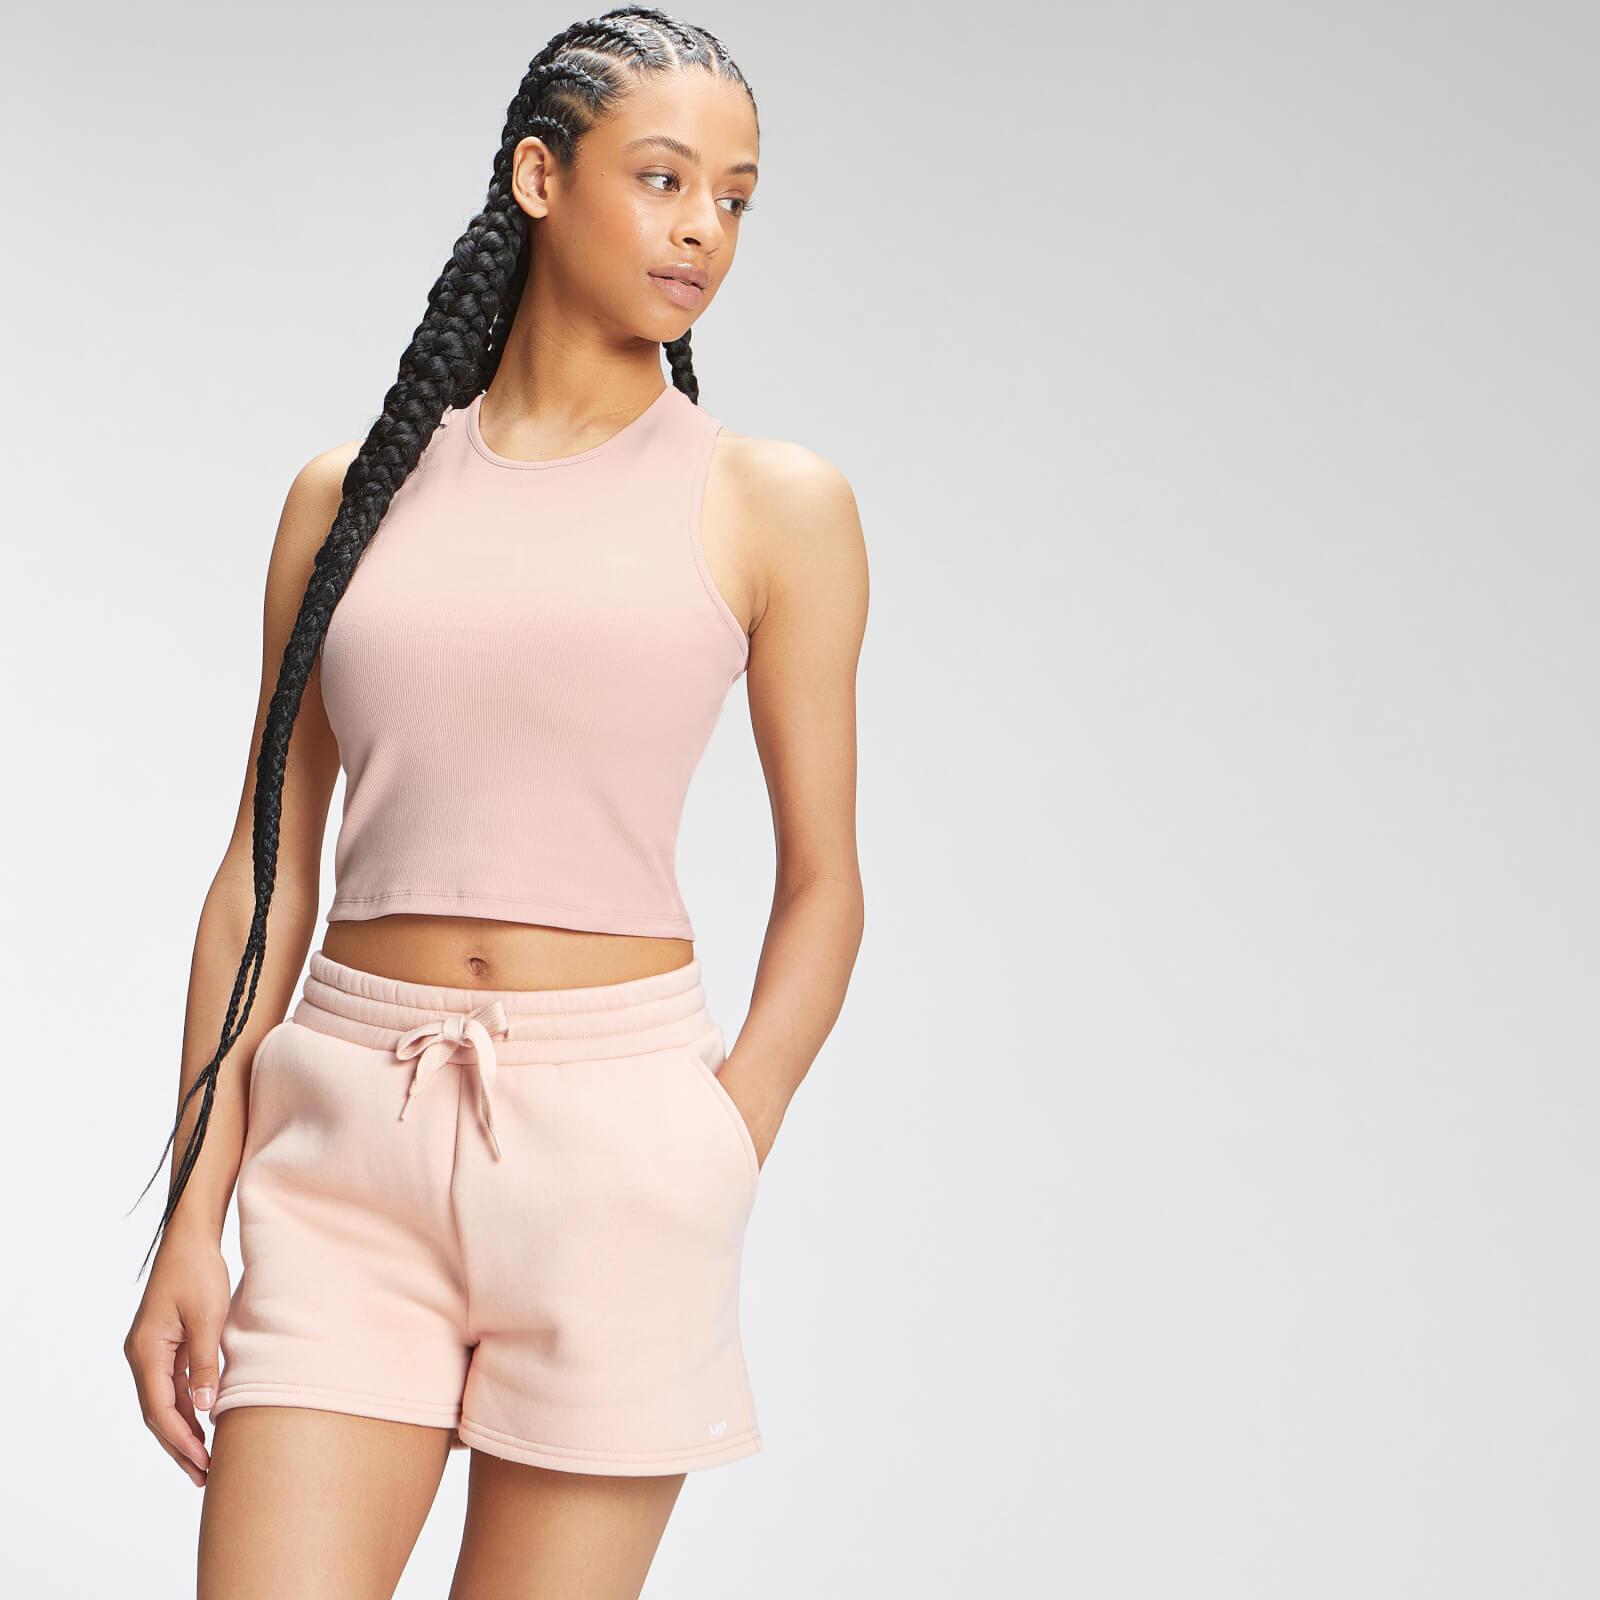 Купить MP Women's Essential Cropped Rib Vest - Light Pink - XXL, Myprotein International